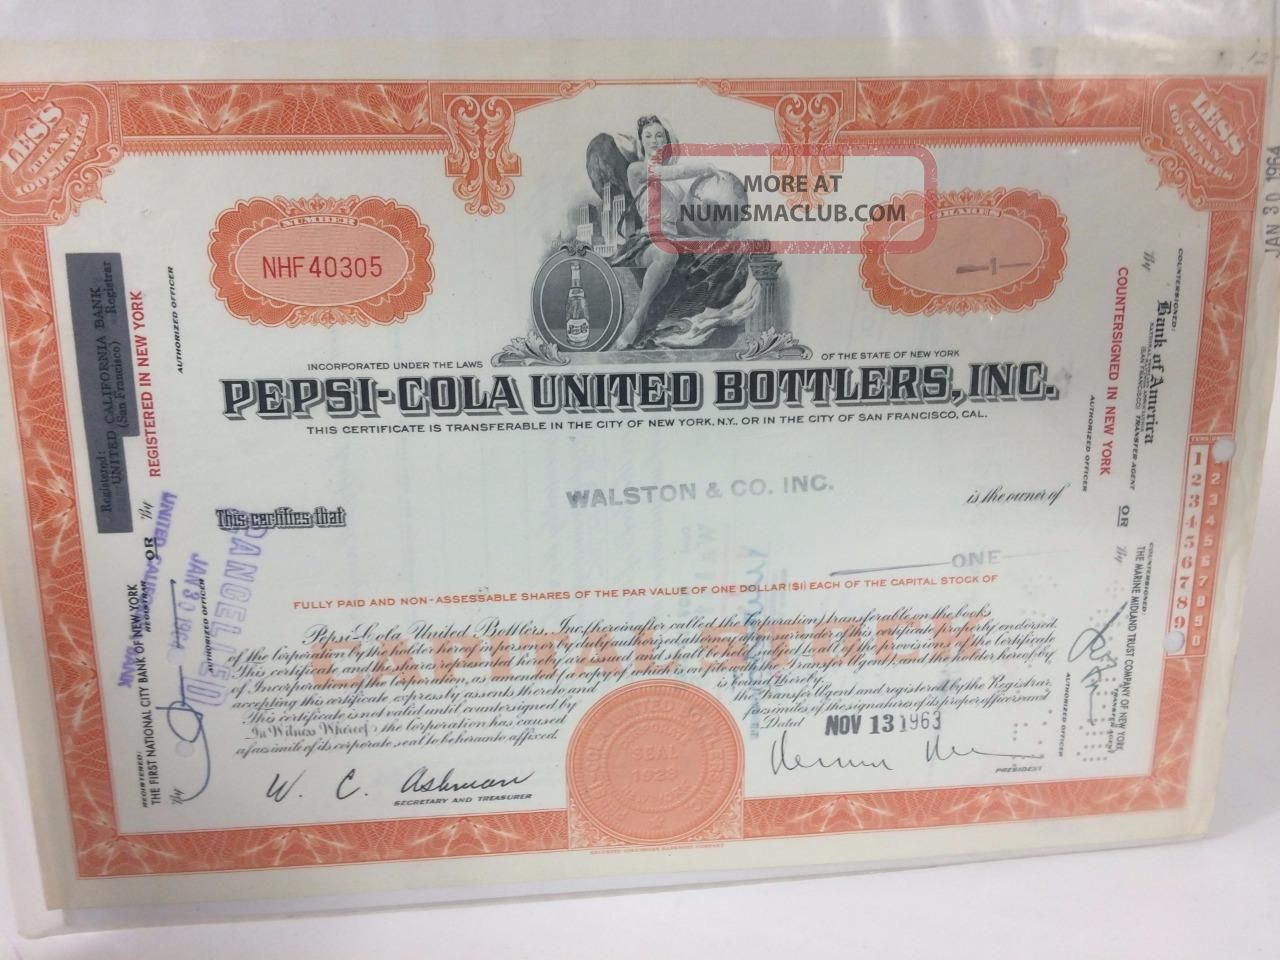 Pepsi - Cola United Bottlers Capital Stock Certificate One Share 1963 Vintage Stocks & Bonds, Scripophily photo